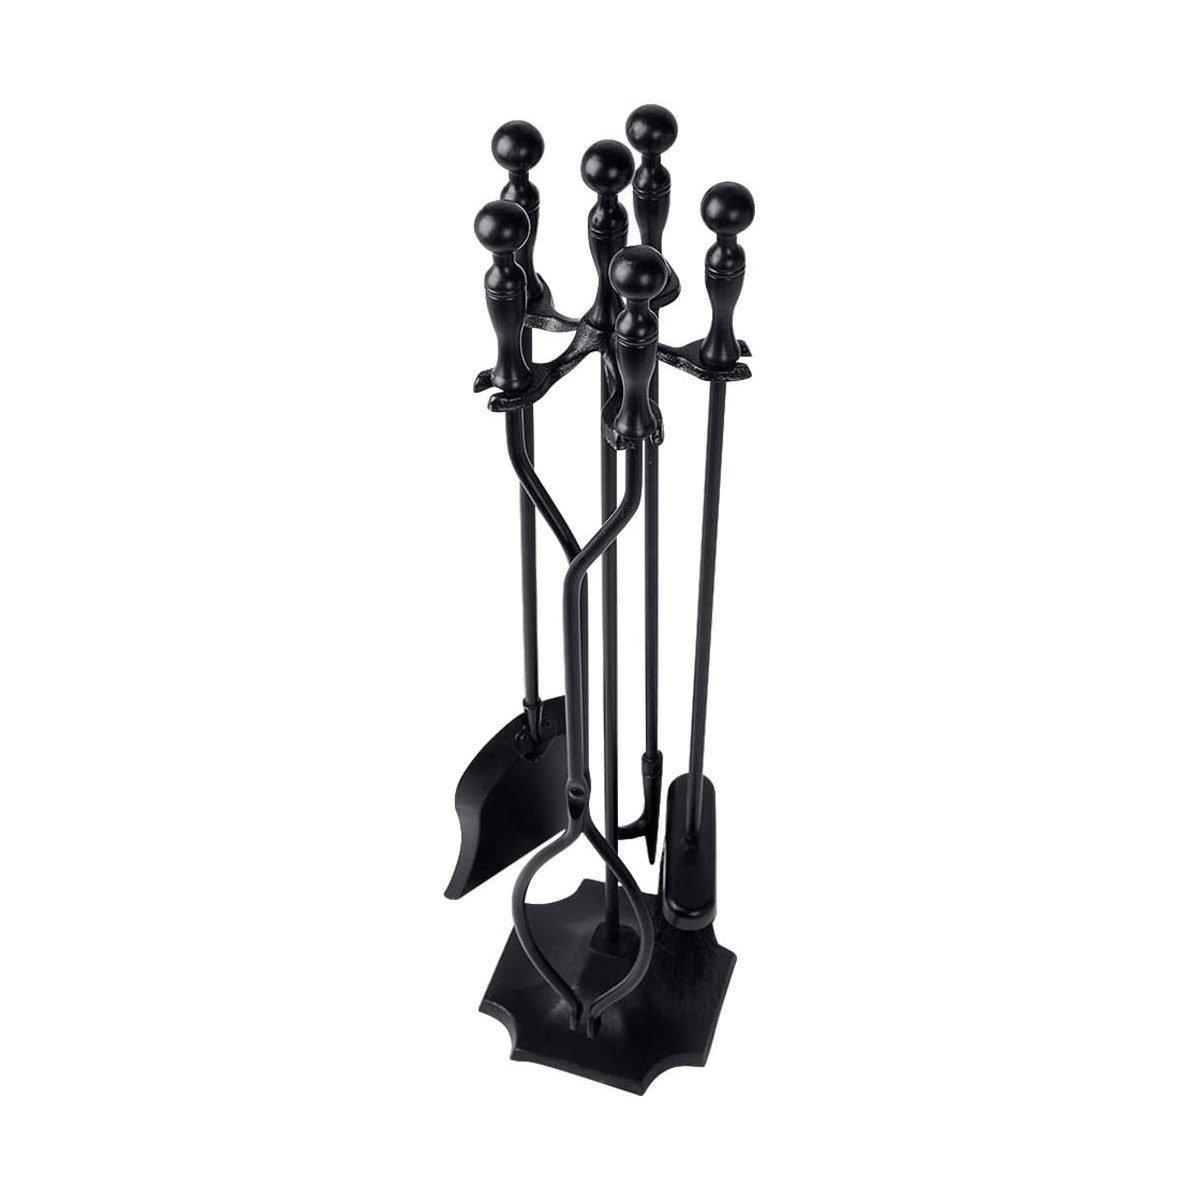 Fire tool kit